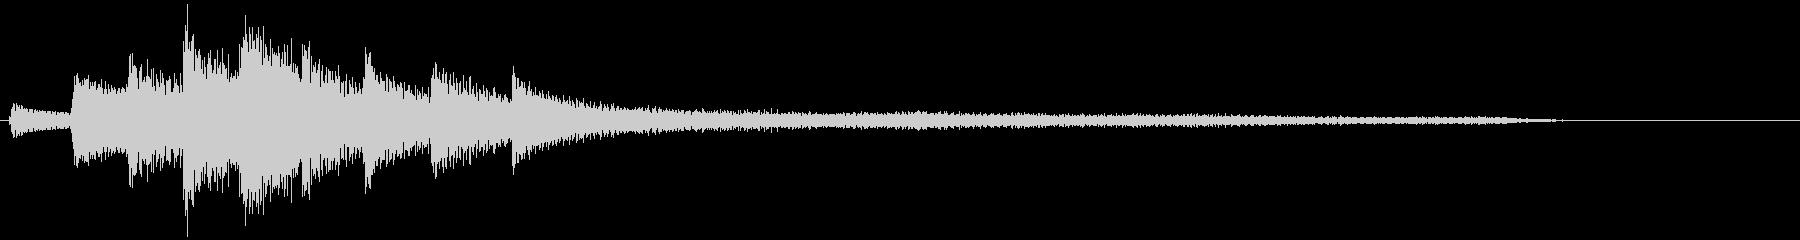 タラララララララ~(ピアノ)_02の未再生の波形